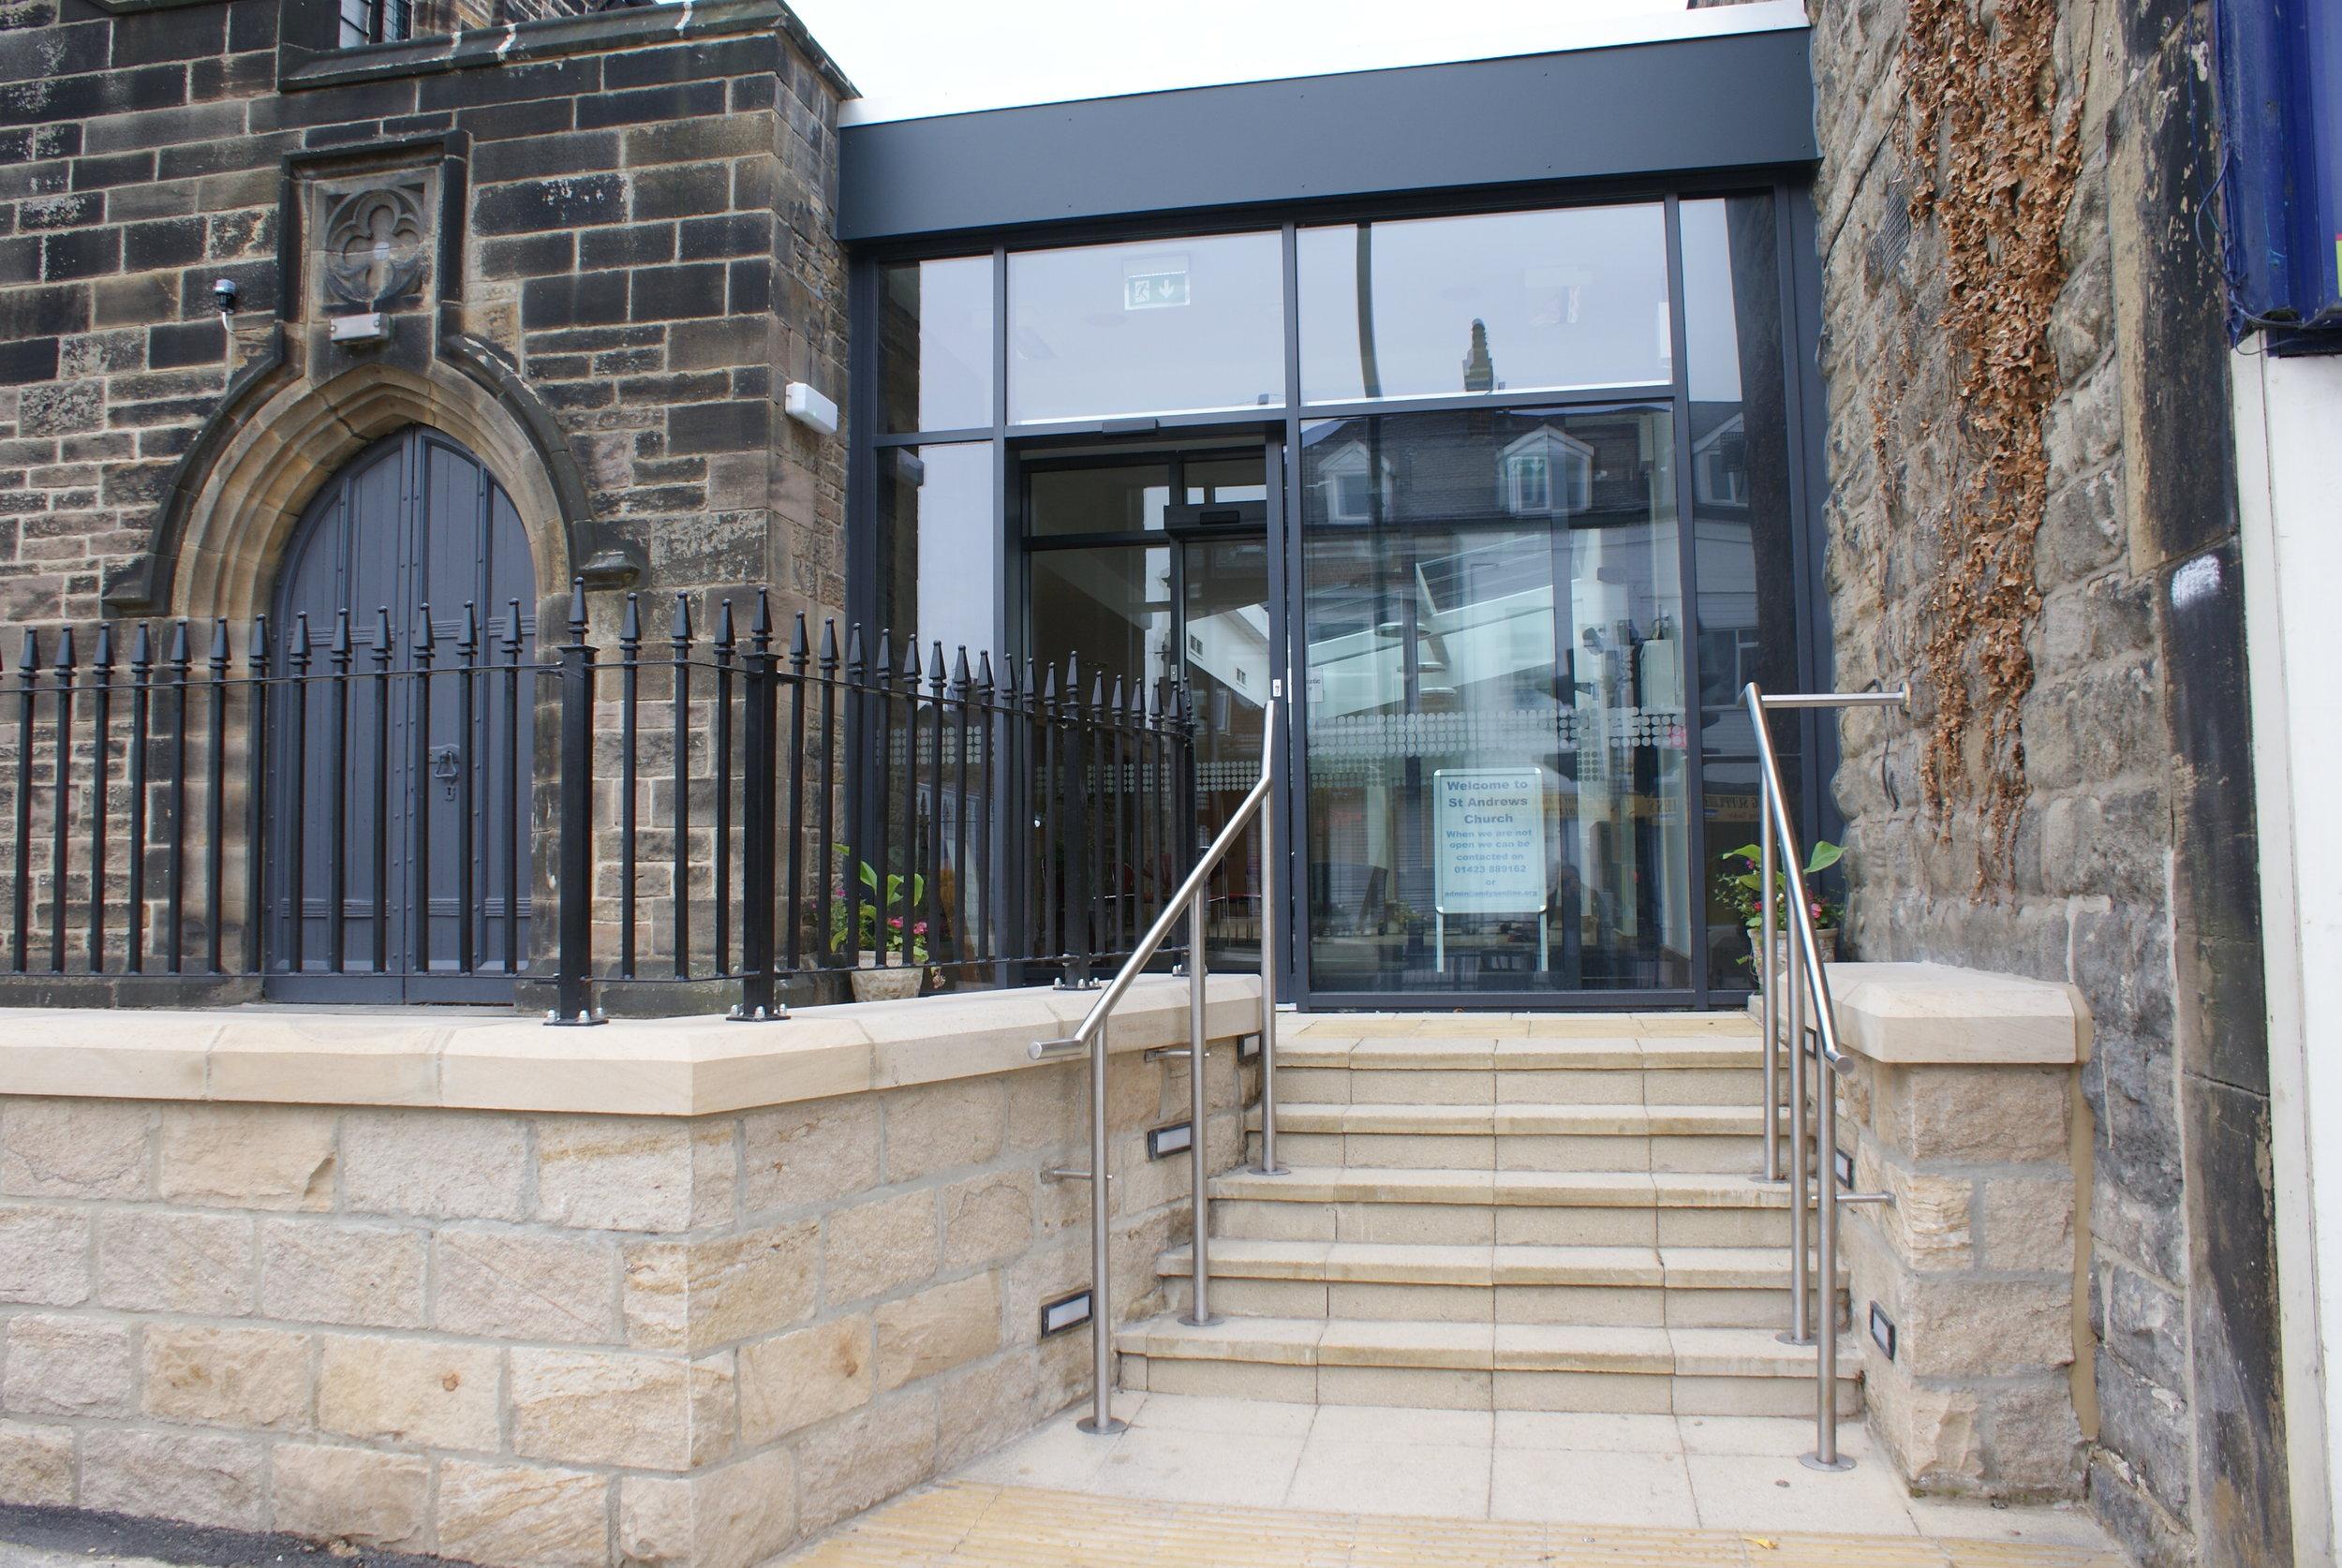 The glazed automatic entrance doors.